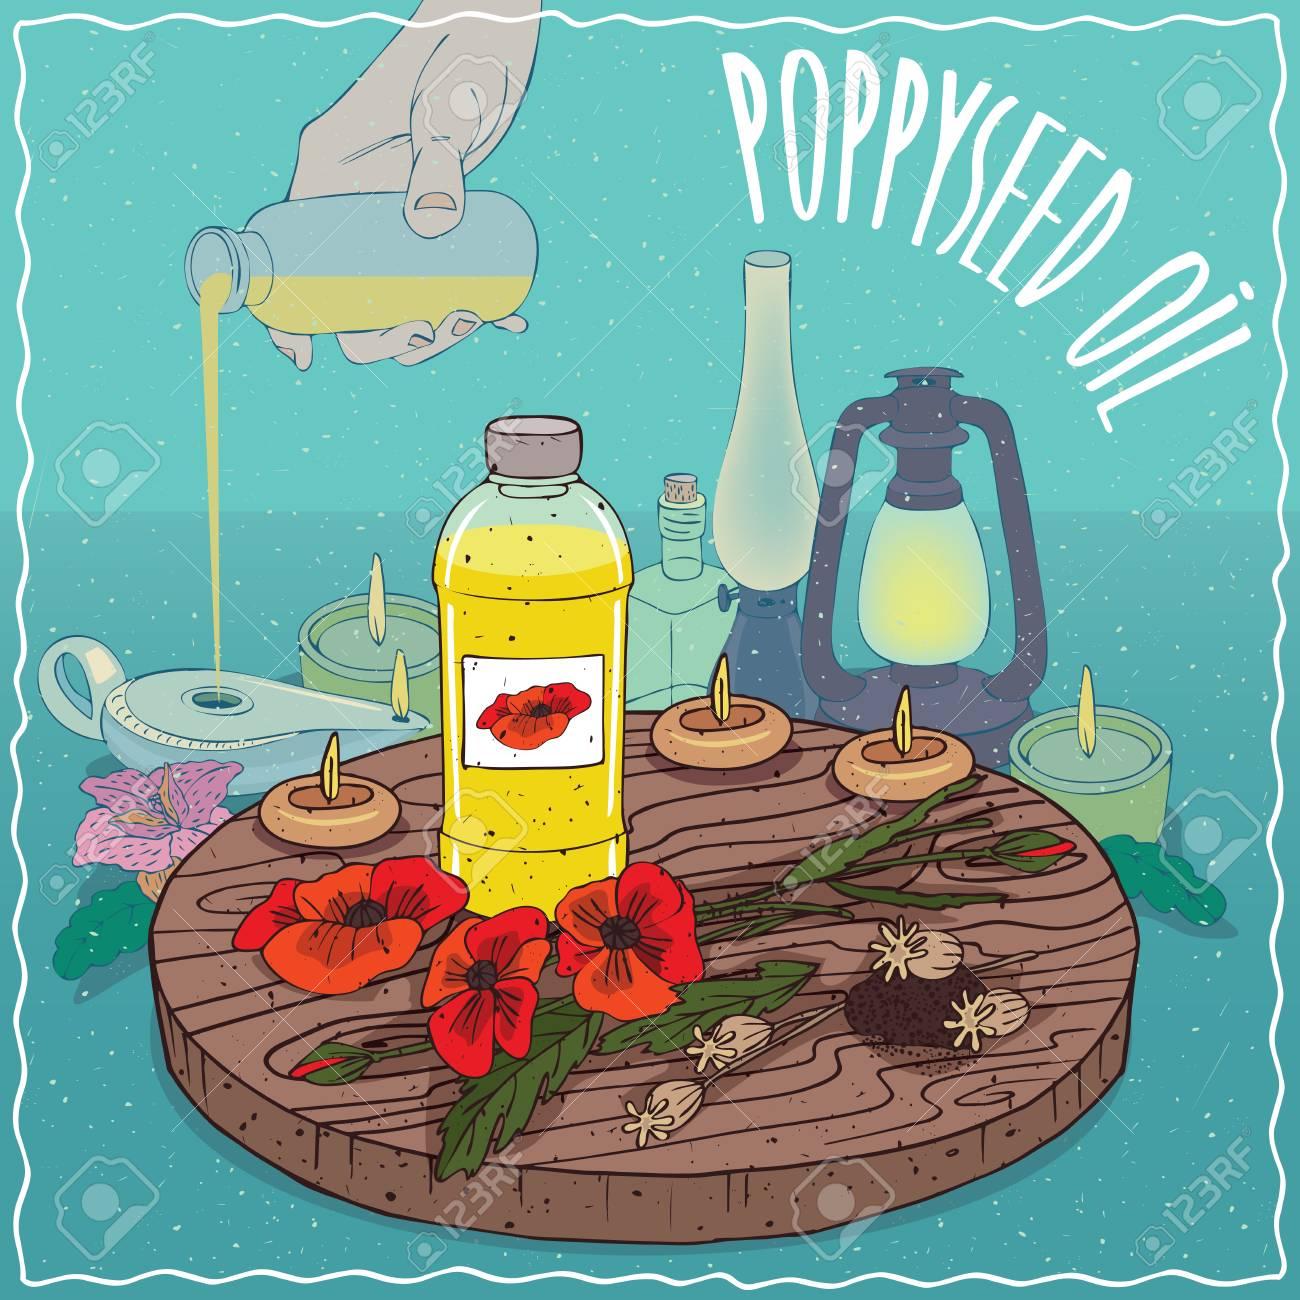 Plastic bottle of poppyseed oil and poppy flowers and seeds plastic bottle of poppyseed oil and poppy flowers and seeds hand filling ancient oil lamp mightylinksfo